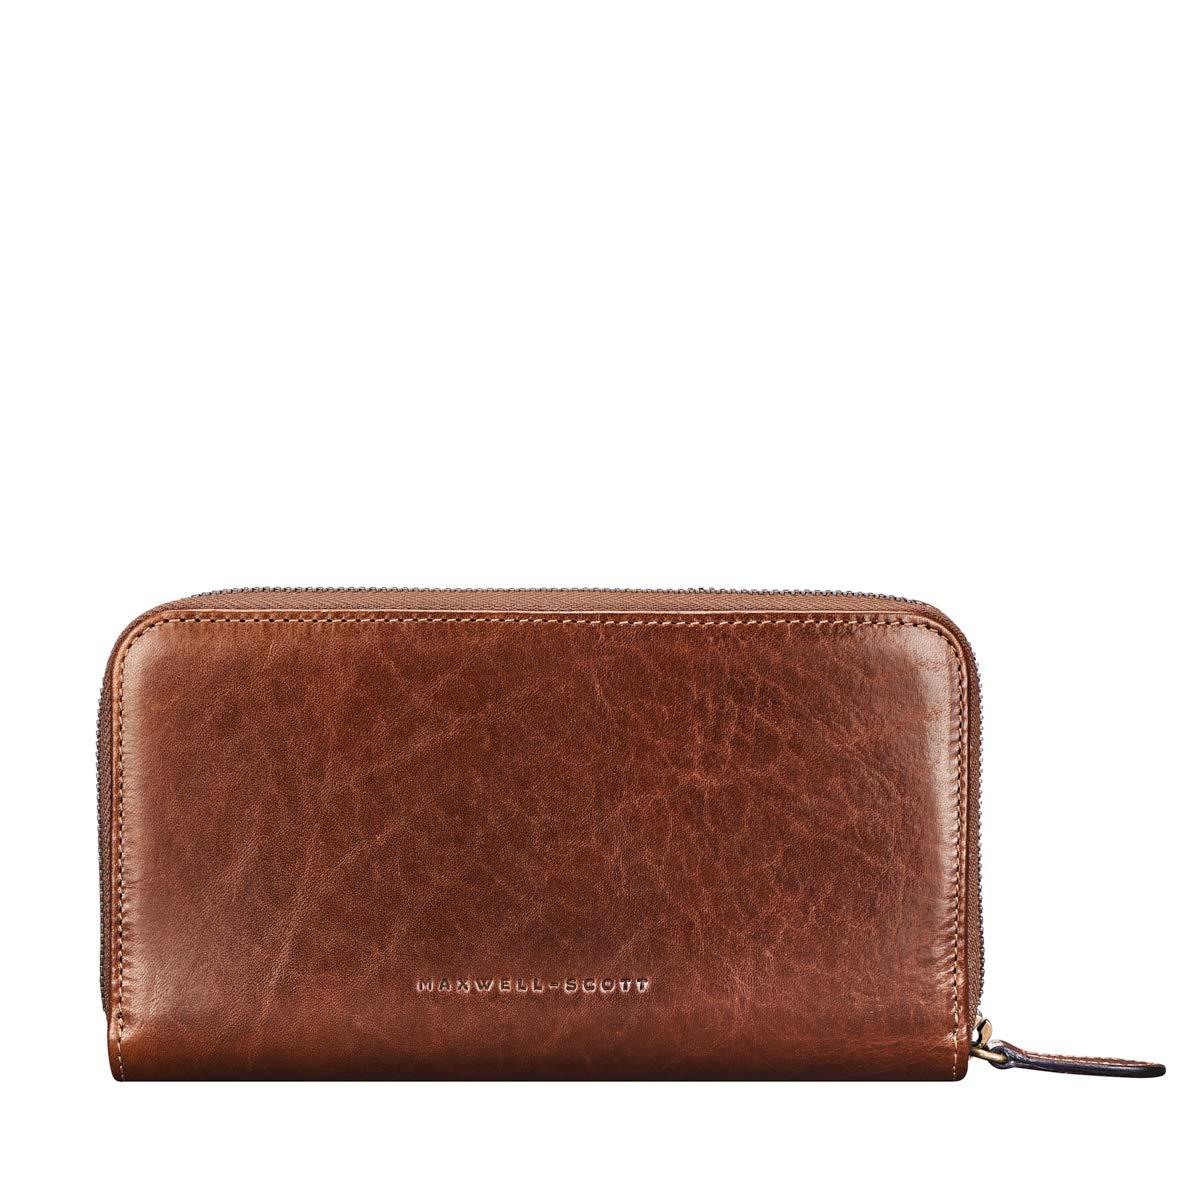 0b7048290402 Maxwell Scott® Personalised Luxury Tan Leather Zip Around Purse (Giorgia)   Maxwell Scott  Amazon.co.uk  Luggage